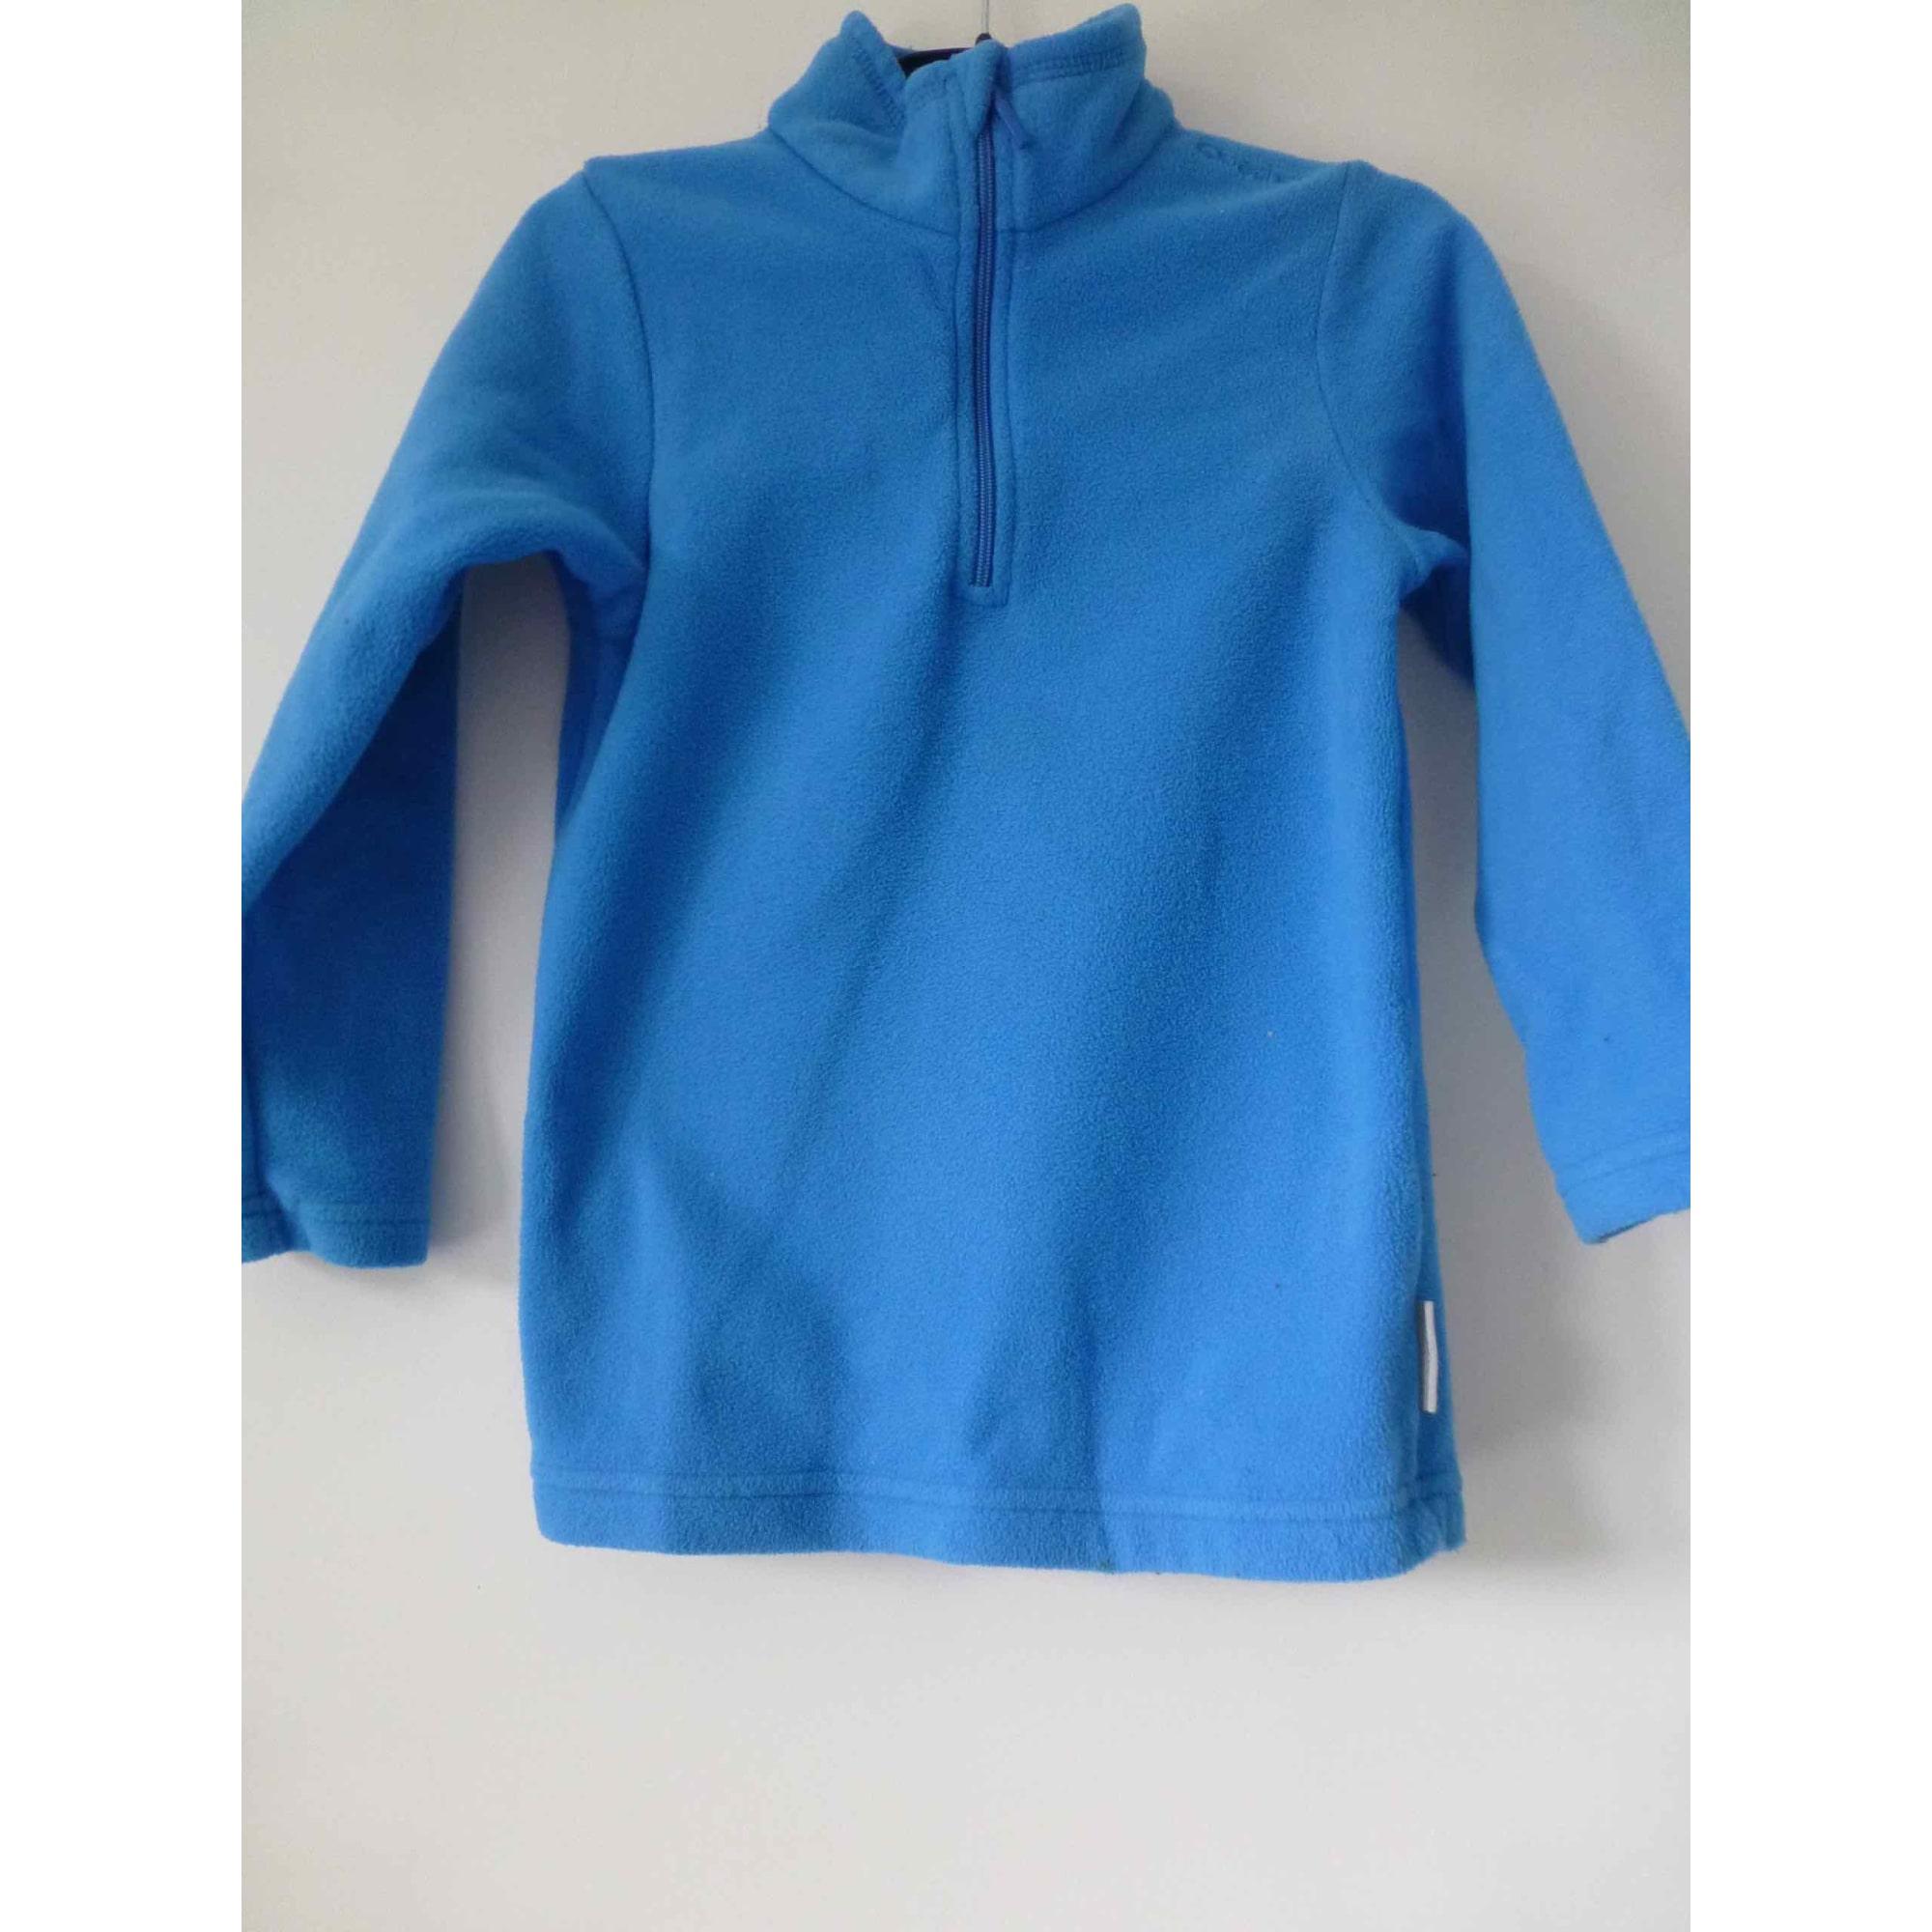 Polaire QUECHUA Bleu, bleu marine, bleu turquoise